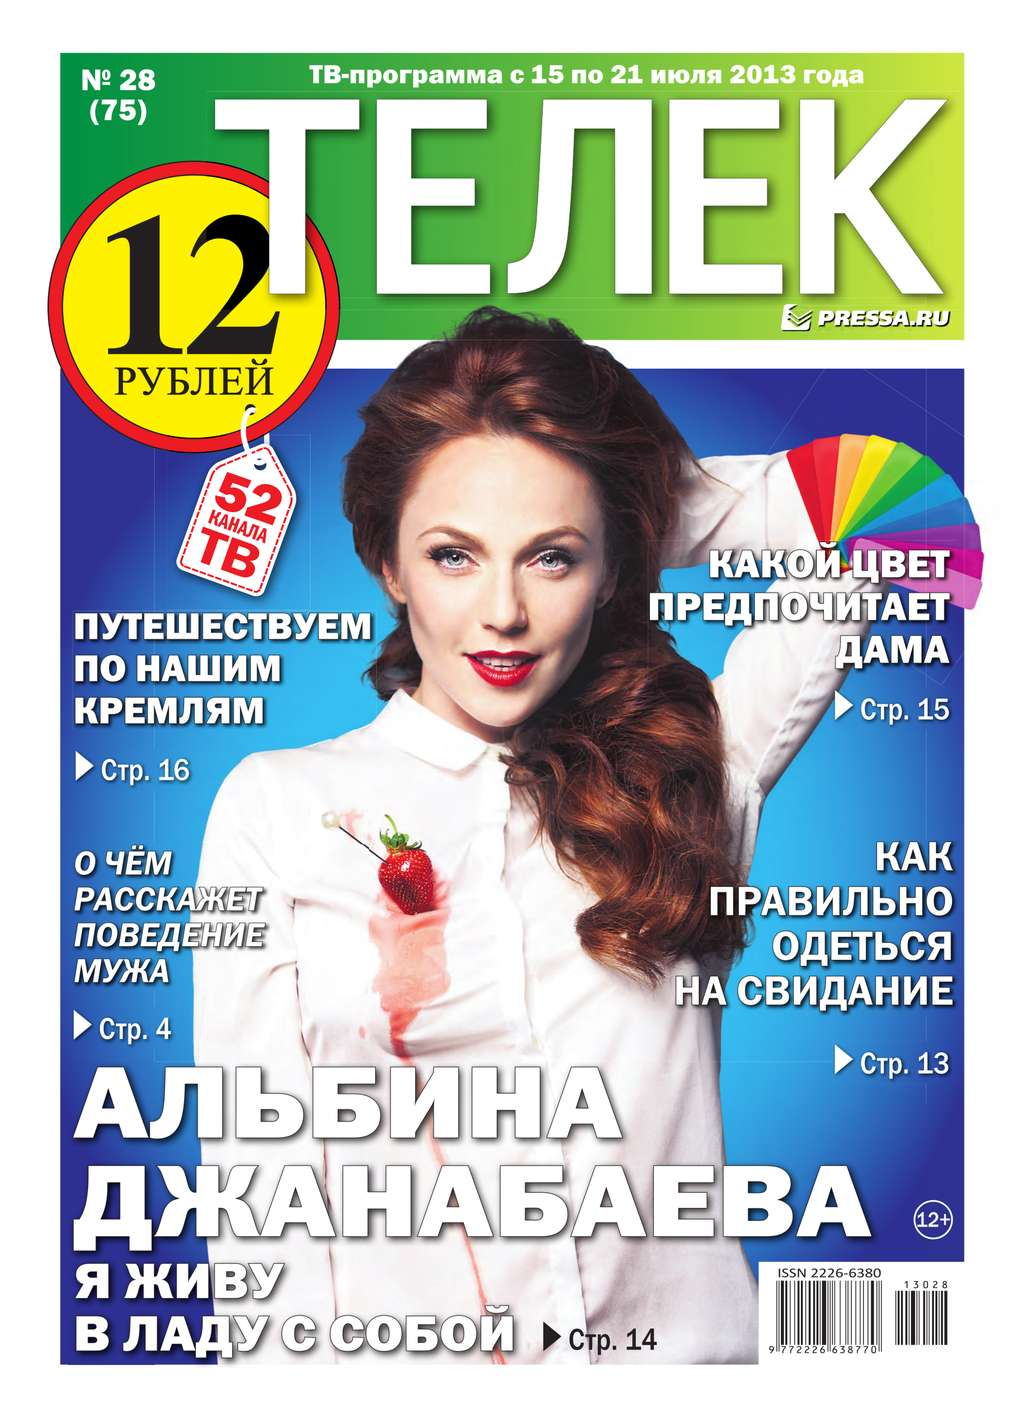 цена на Редакция газеты Телек Pressa.ru Телек 28-2013